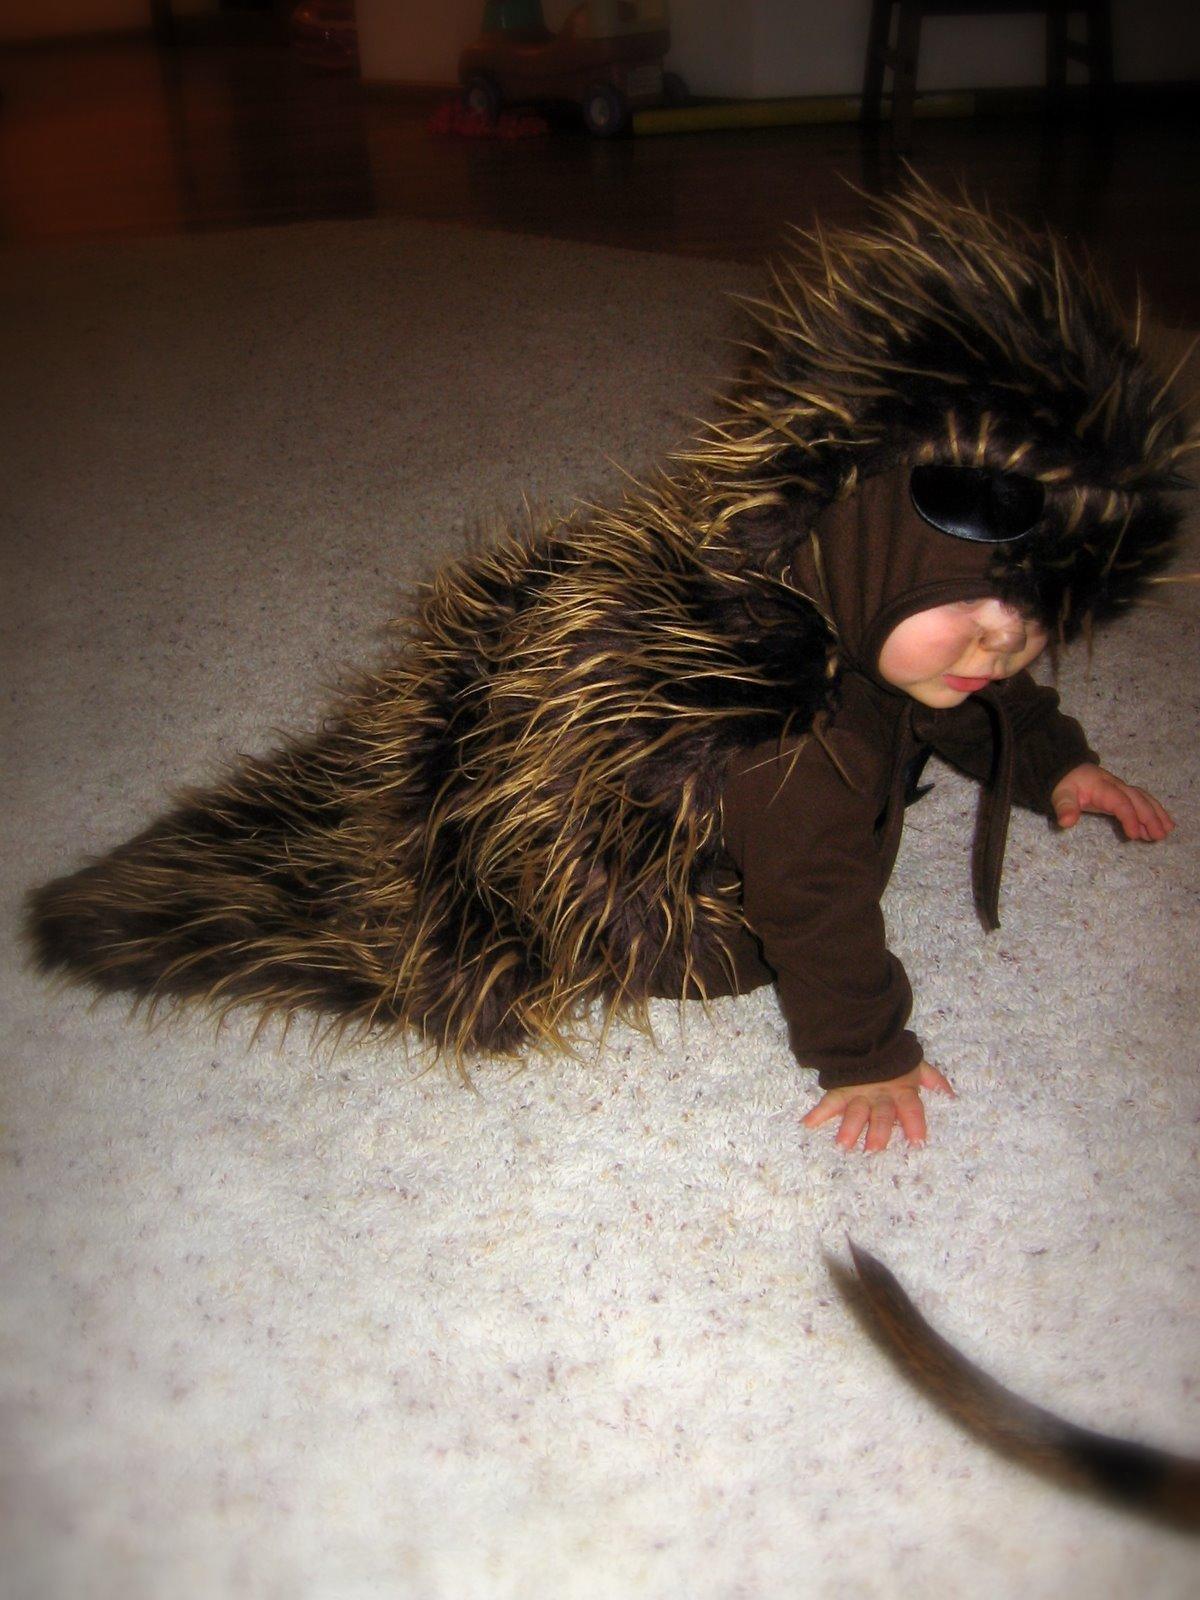 Porcupine Halloween CostumeAwesome Halloween Costume This Is Hilarious & Porcupine Halloween Costume - The Halloween